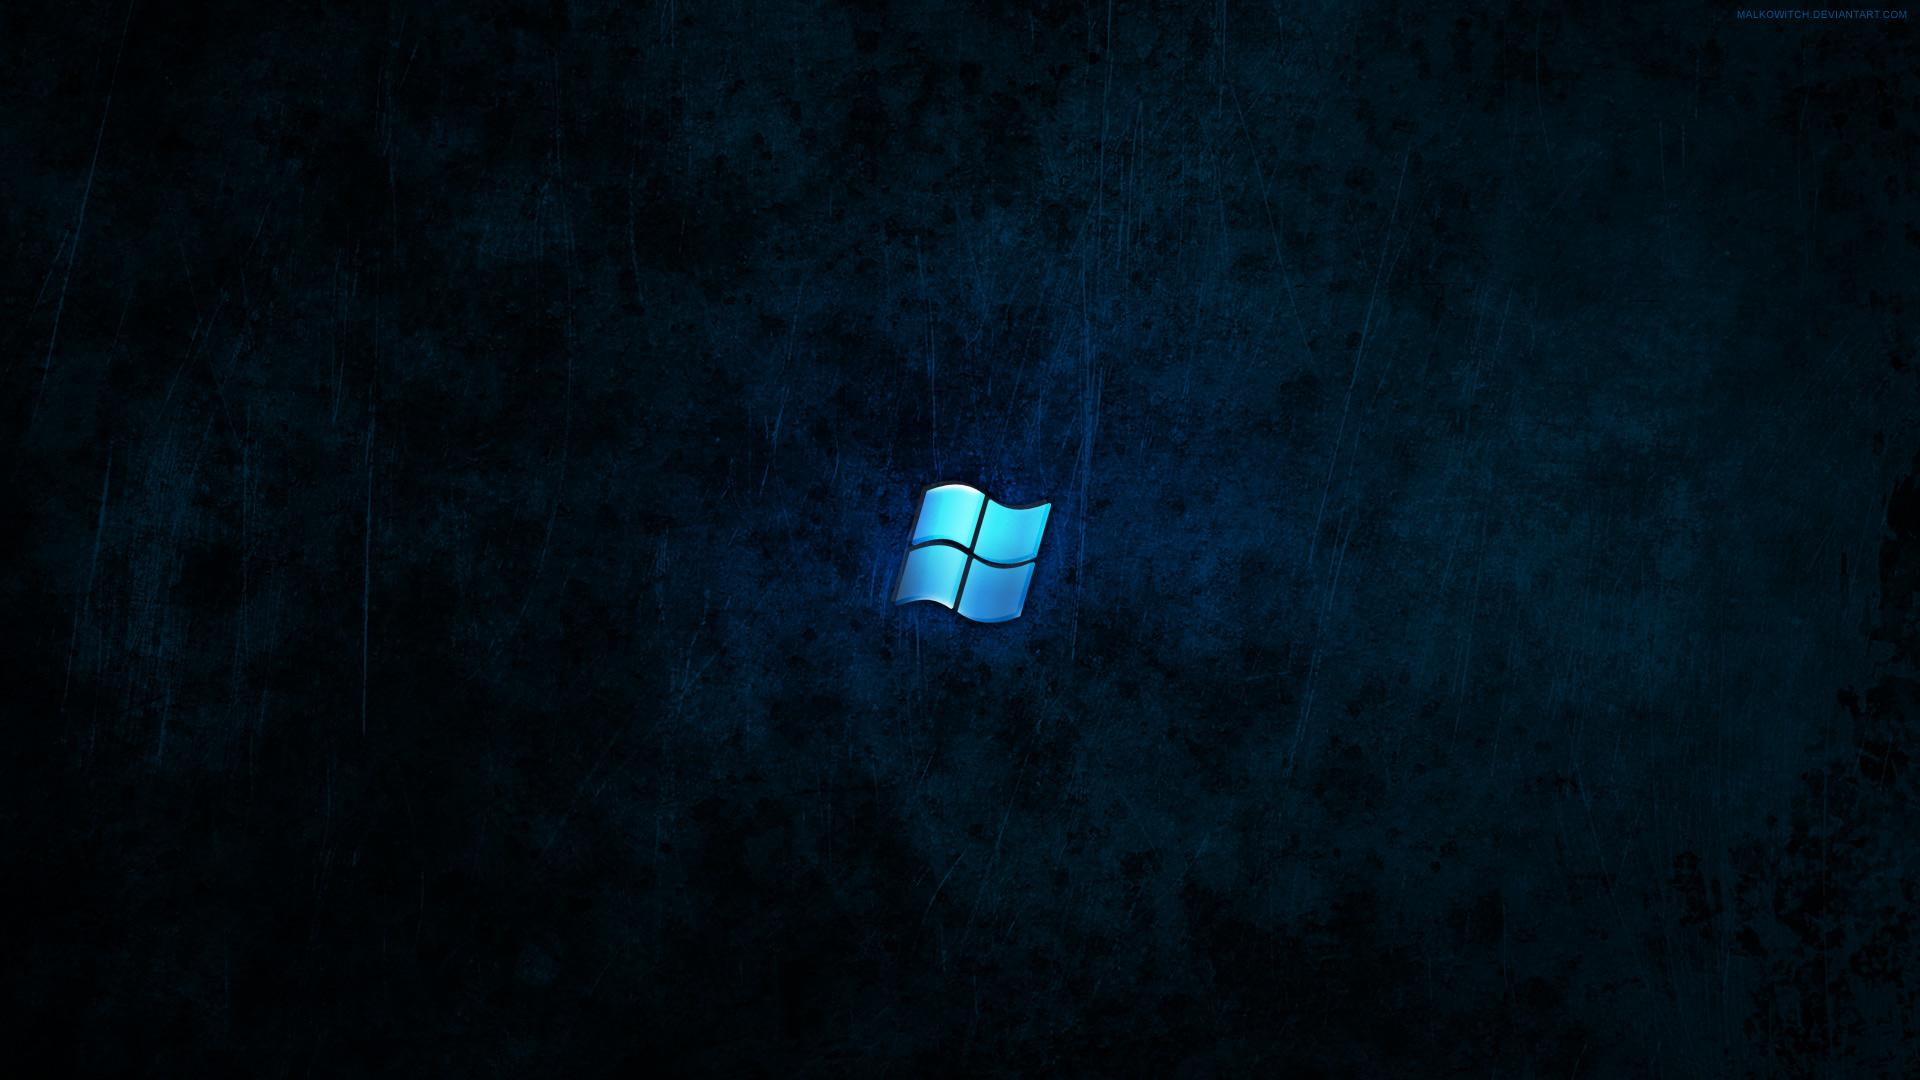 windows wallpaper 1920x1080 wallpaper 595110